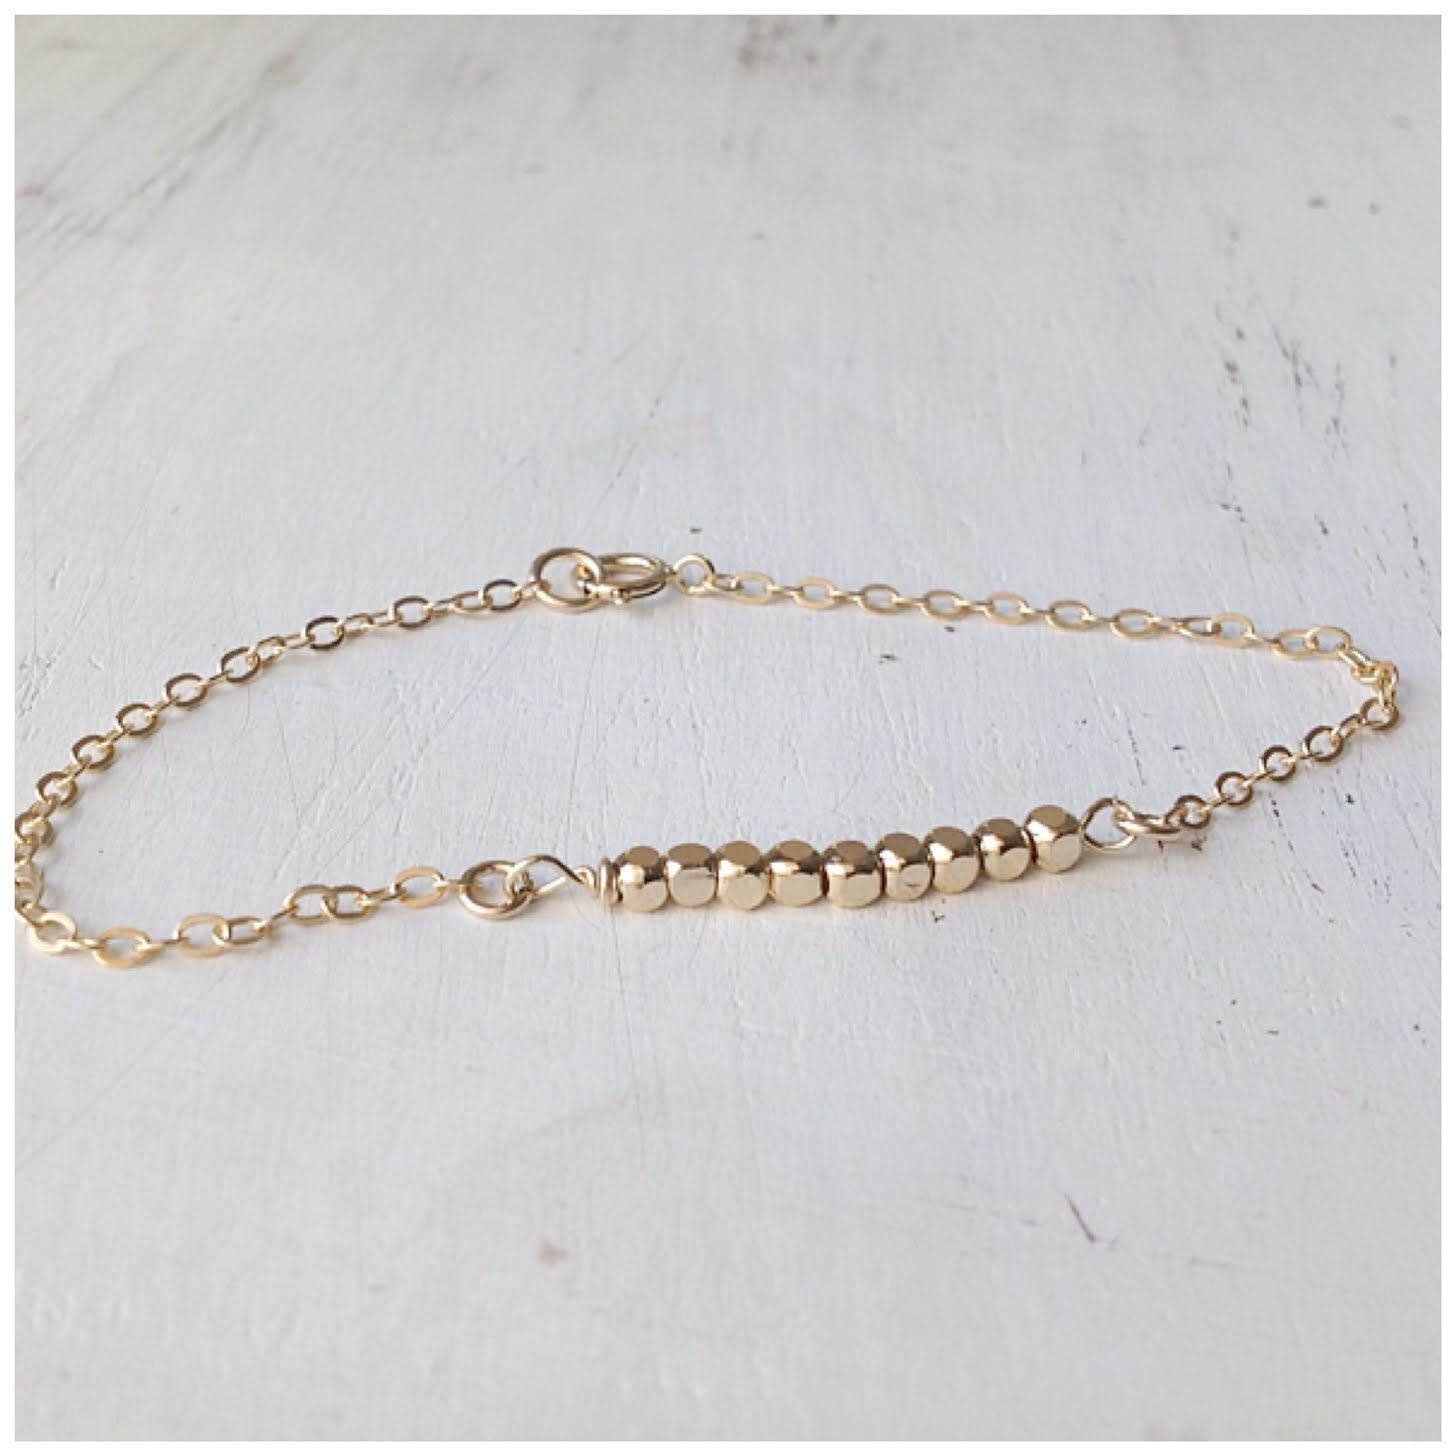 3cc475692 Amazon.com: Gold Bead Bracelet Simple Bracelet Gold Filled Bead Bracelet:  Handmade